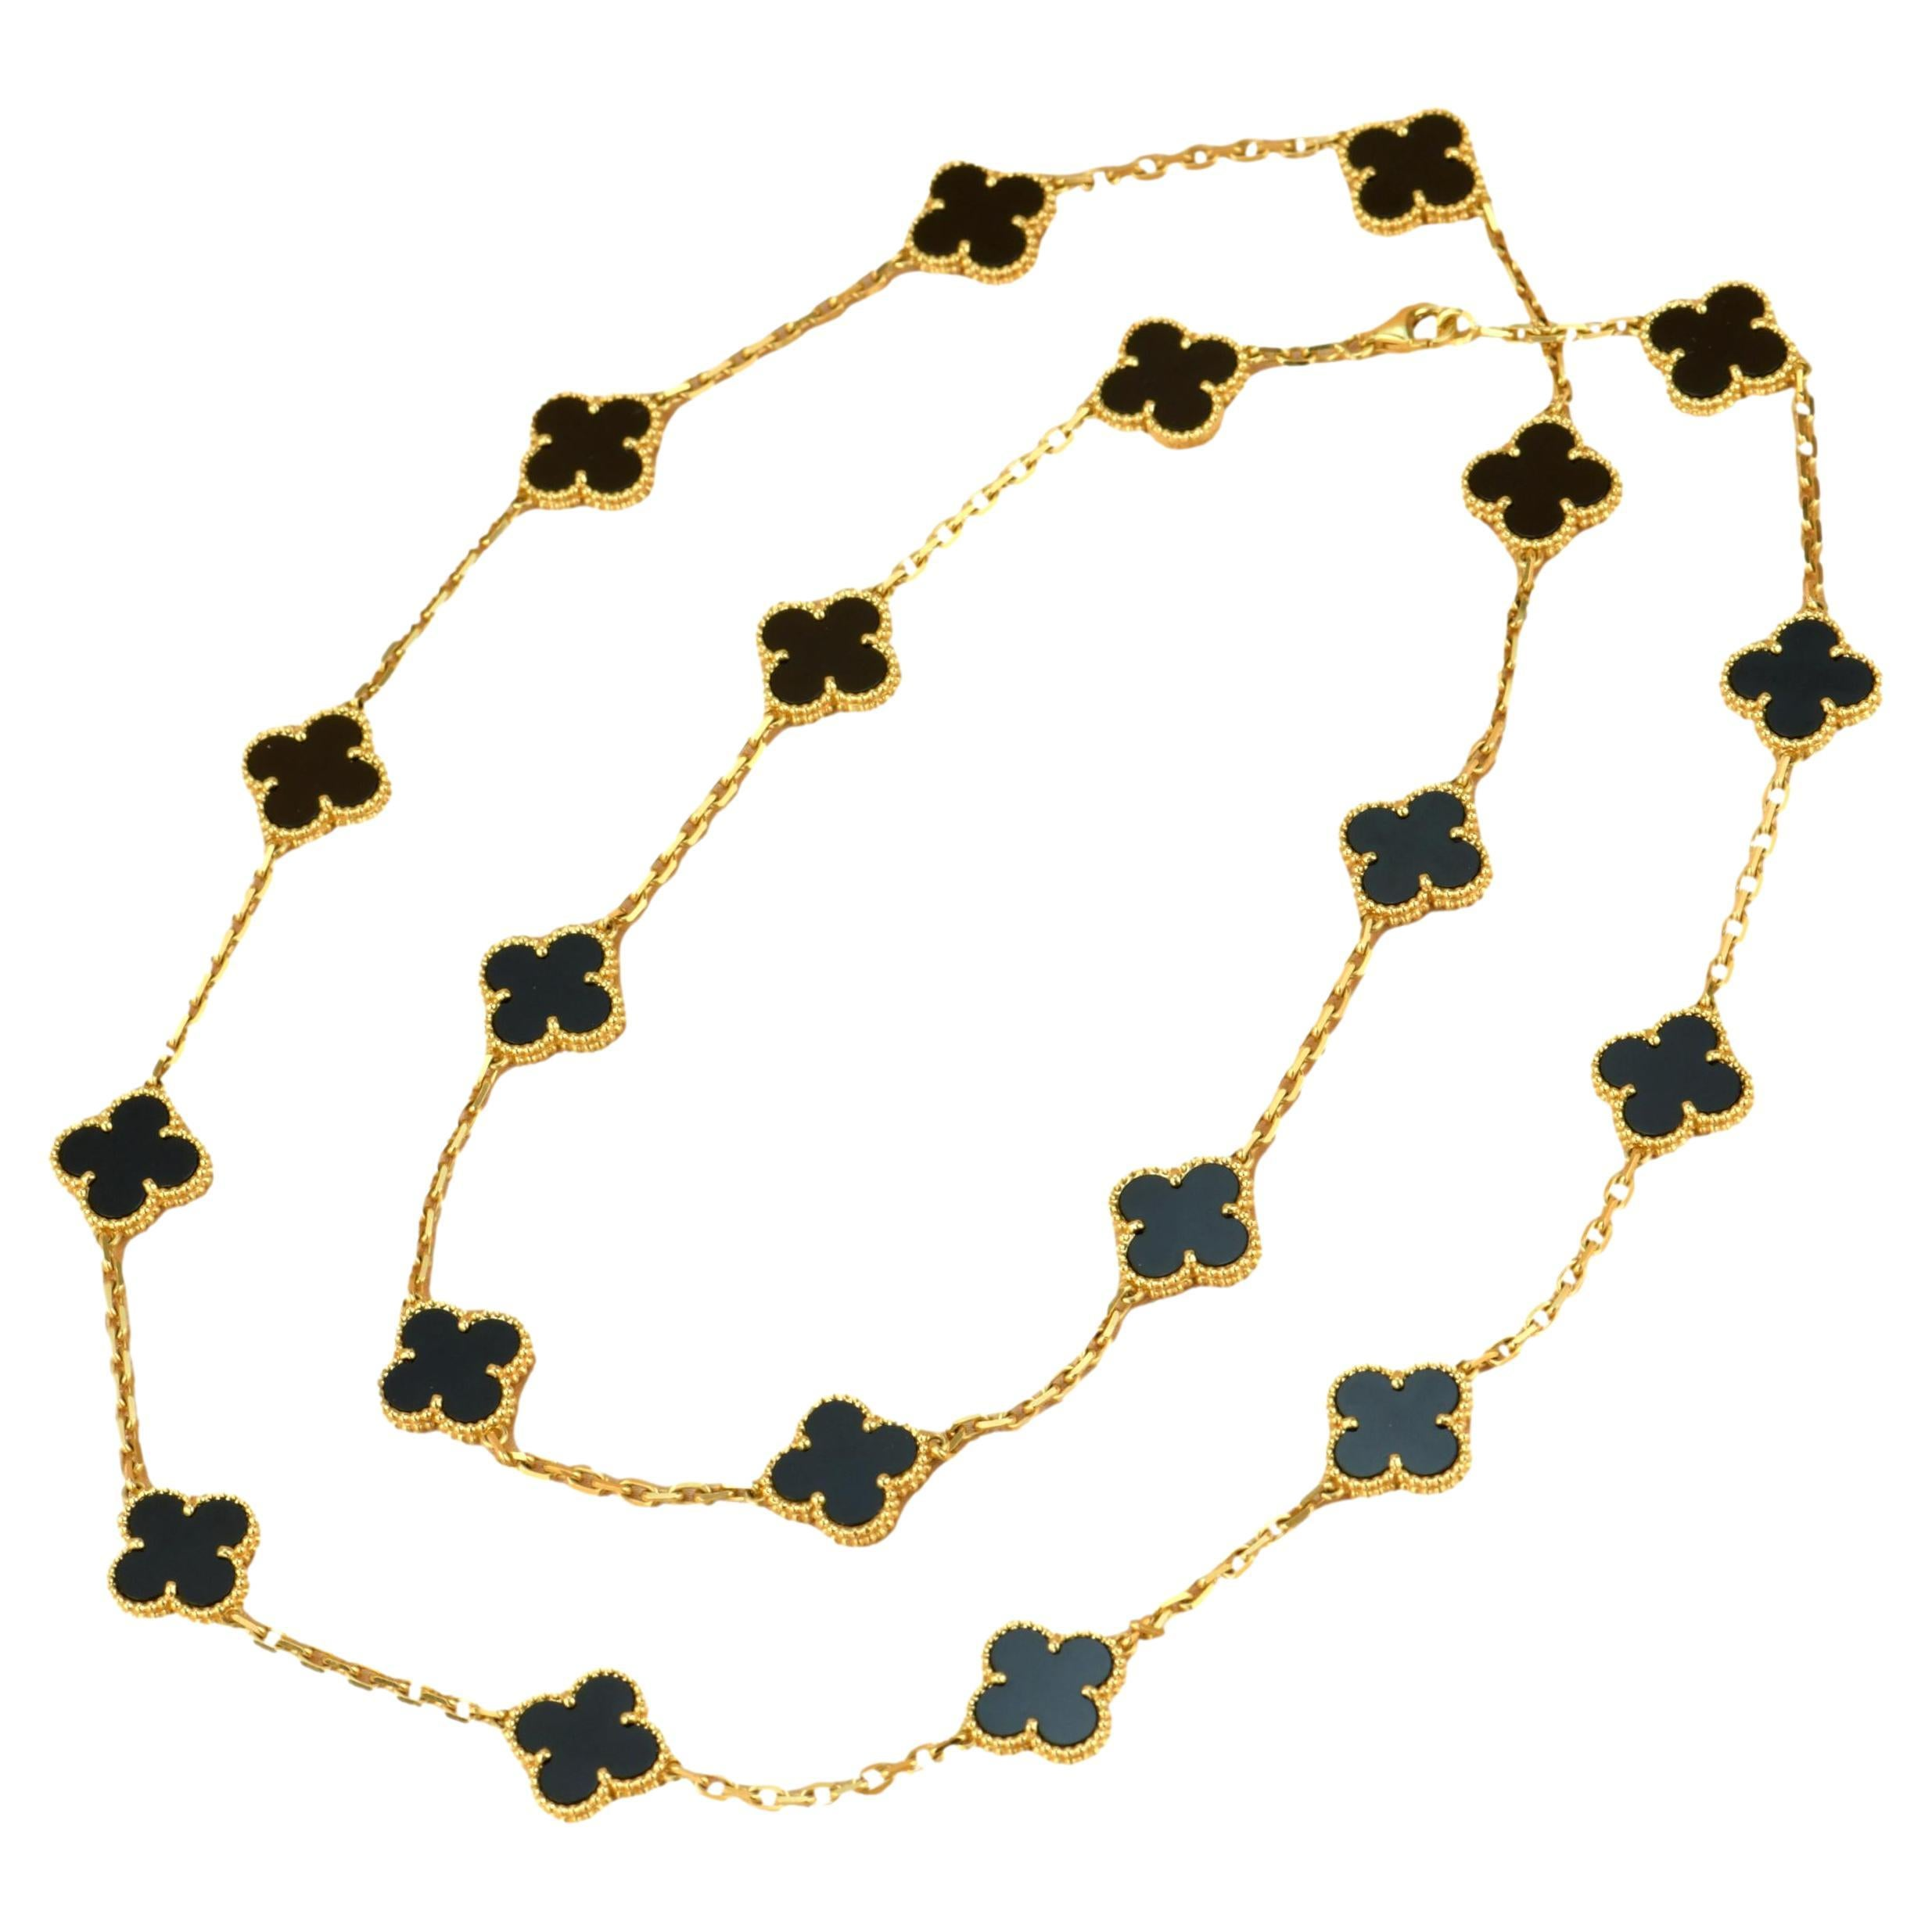 Van Cleef & Arpels Onyx Vintage Alhambra 20 Motif Long Necklace